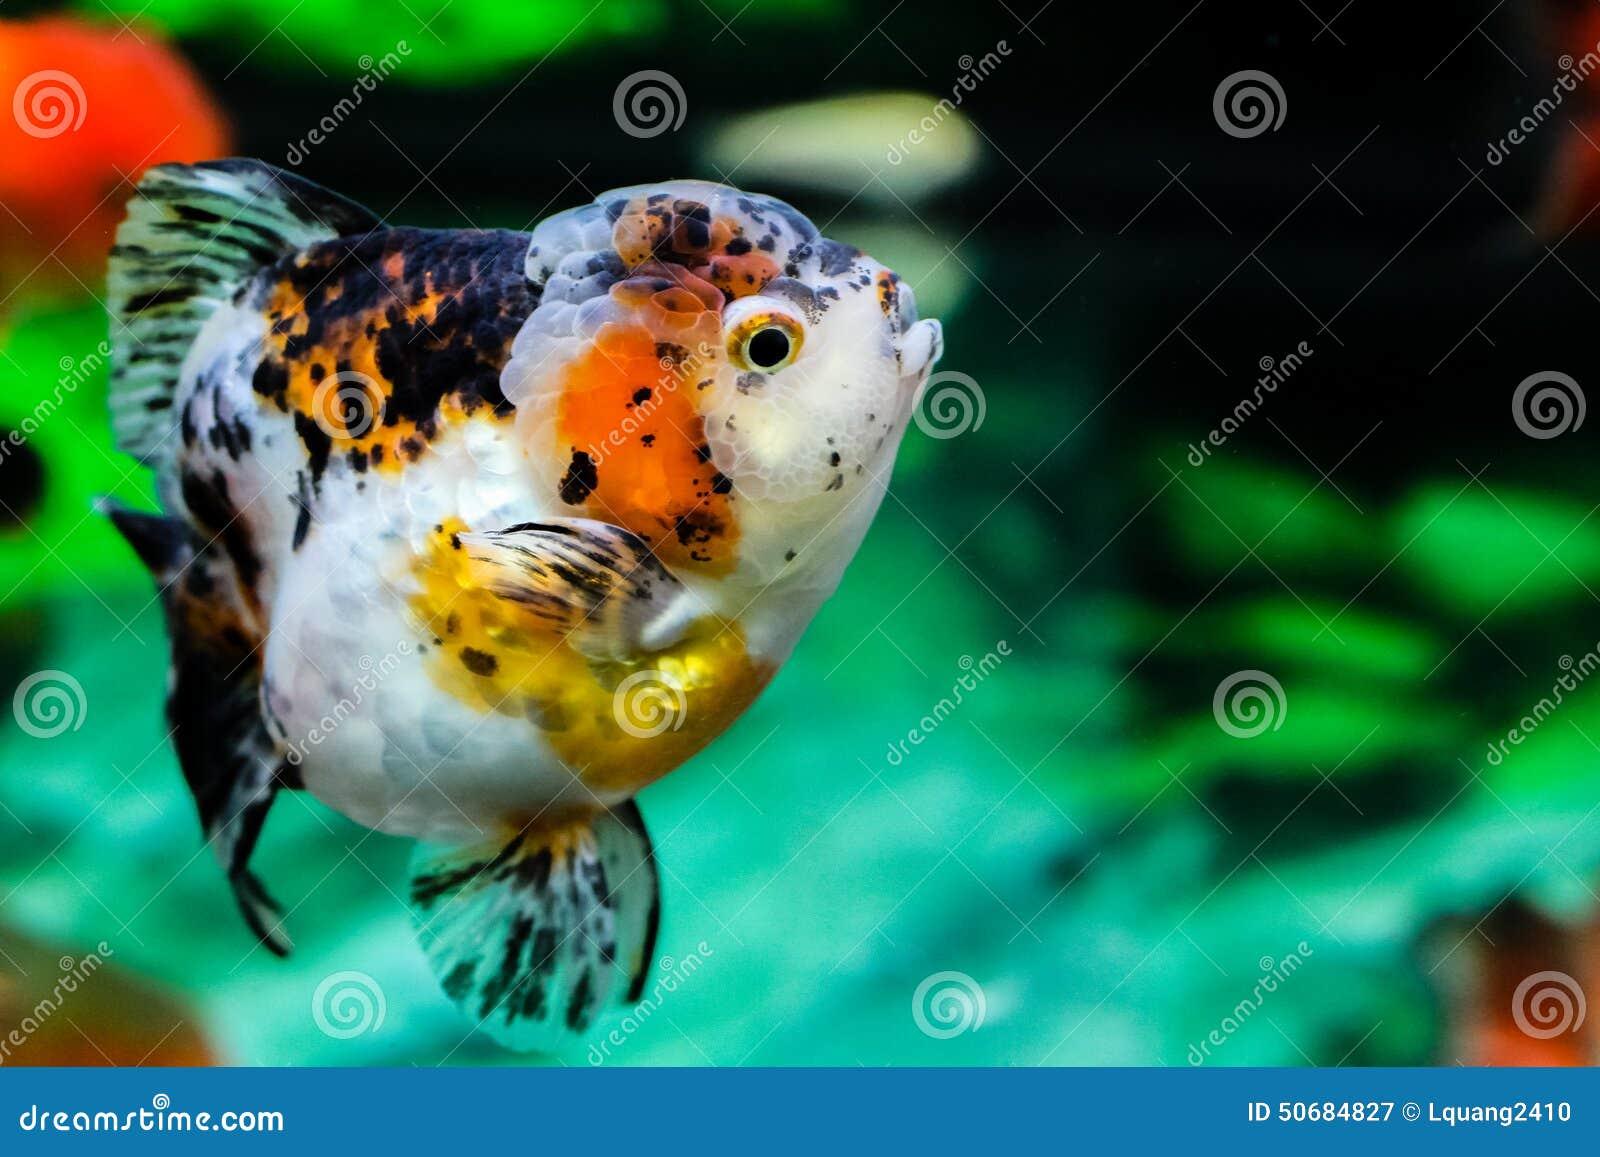 Download 关闭在水族馆的金鱼 库存图片. 图片 包括有 背包, 孤独, 金鱼, bubblegum, 关闭, 水族馆 - 50684827